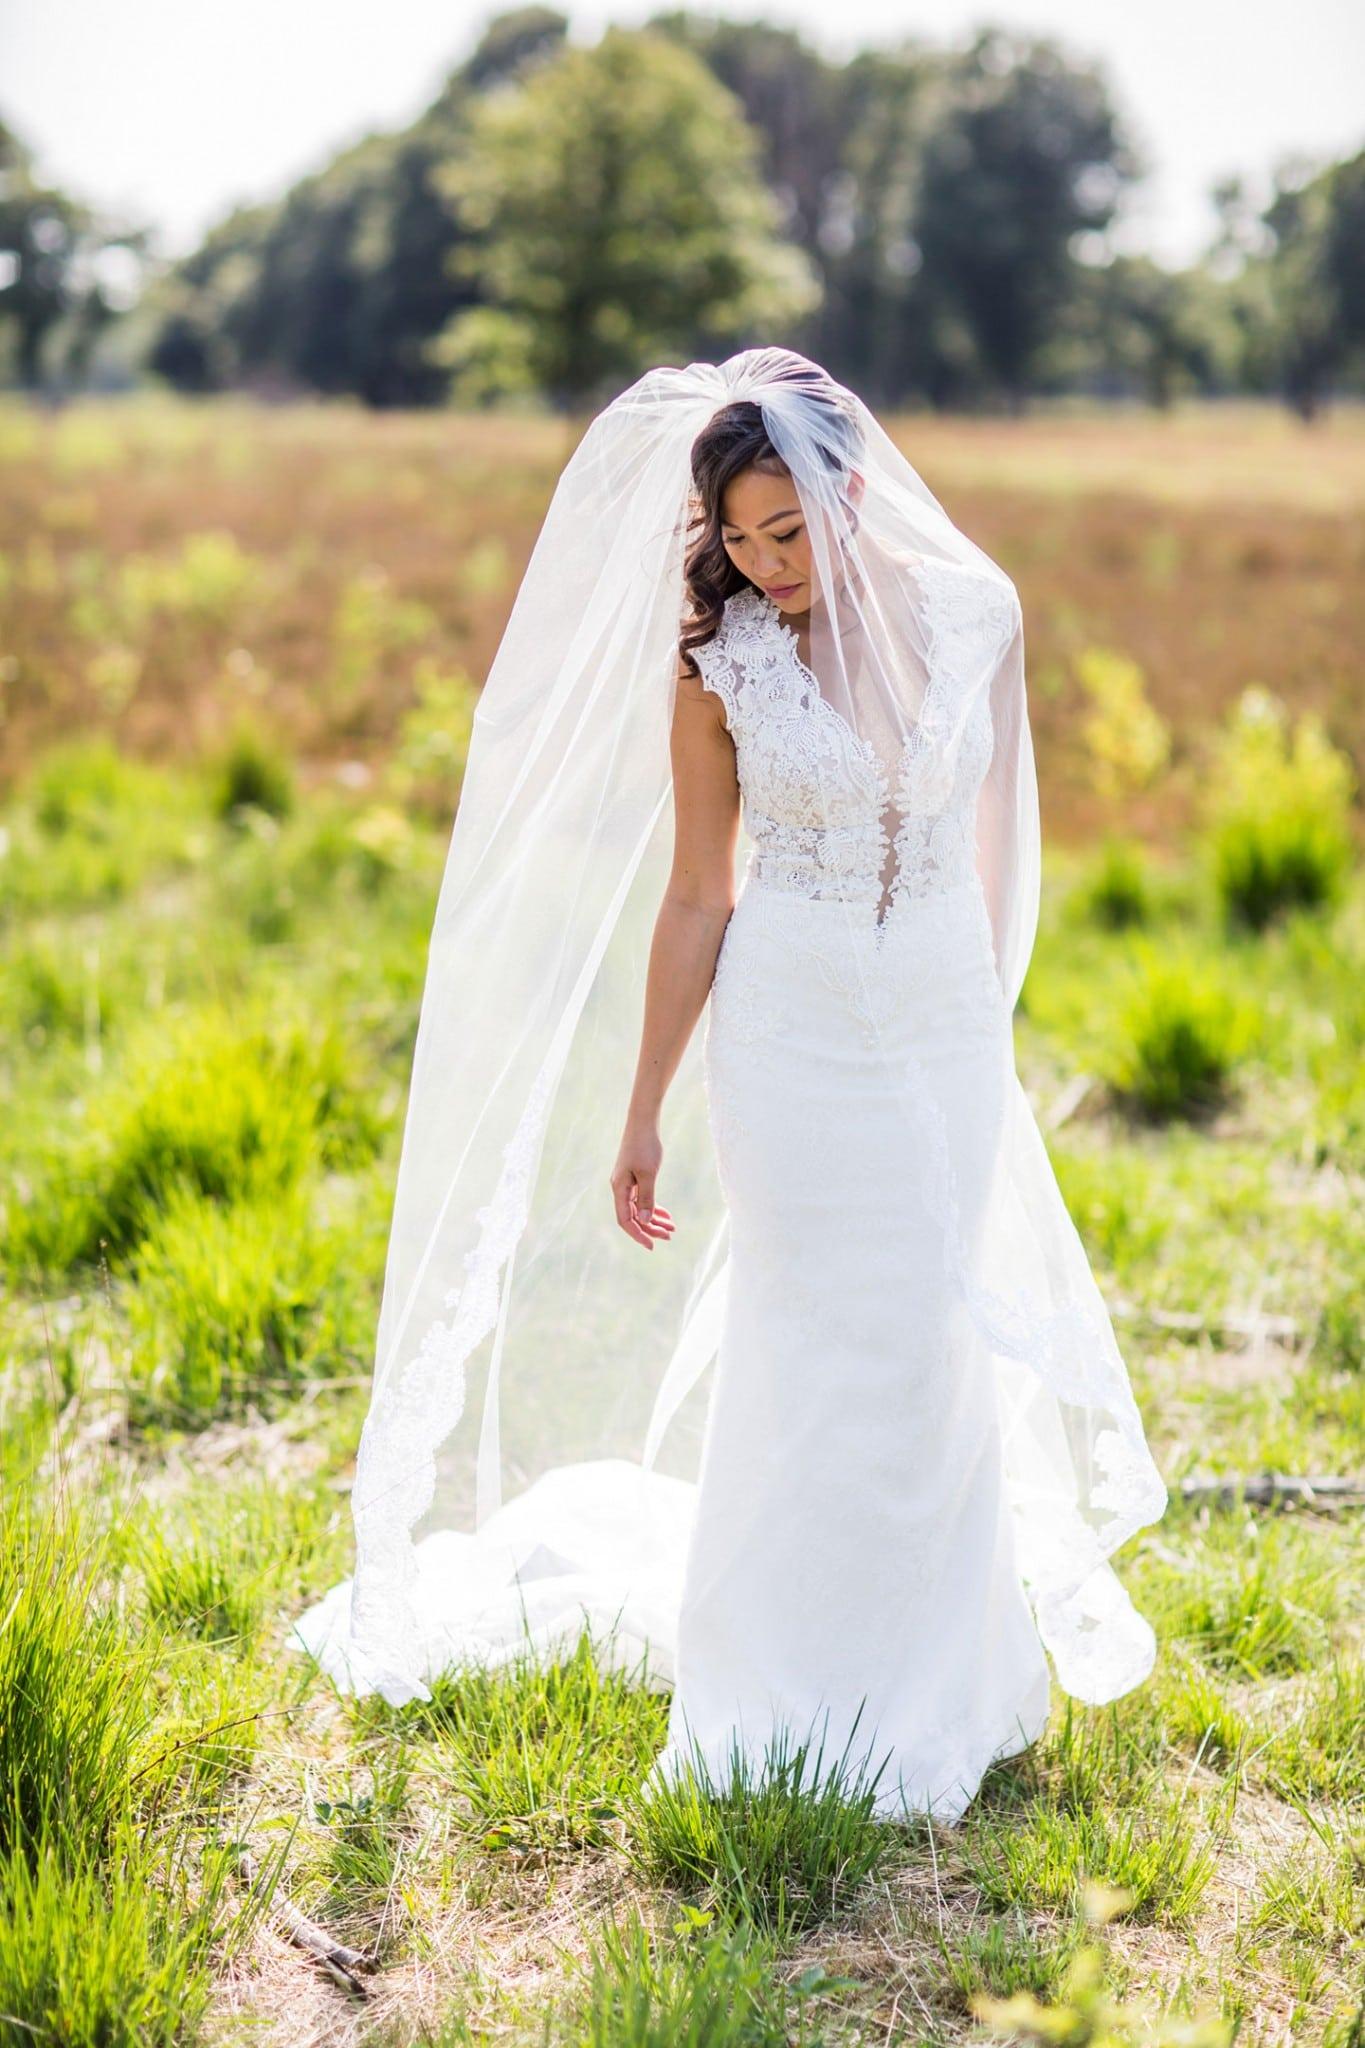 44-De-Wolfsberg-bruidsfotografie-trouwfotograaf